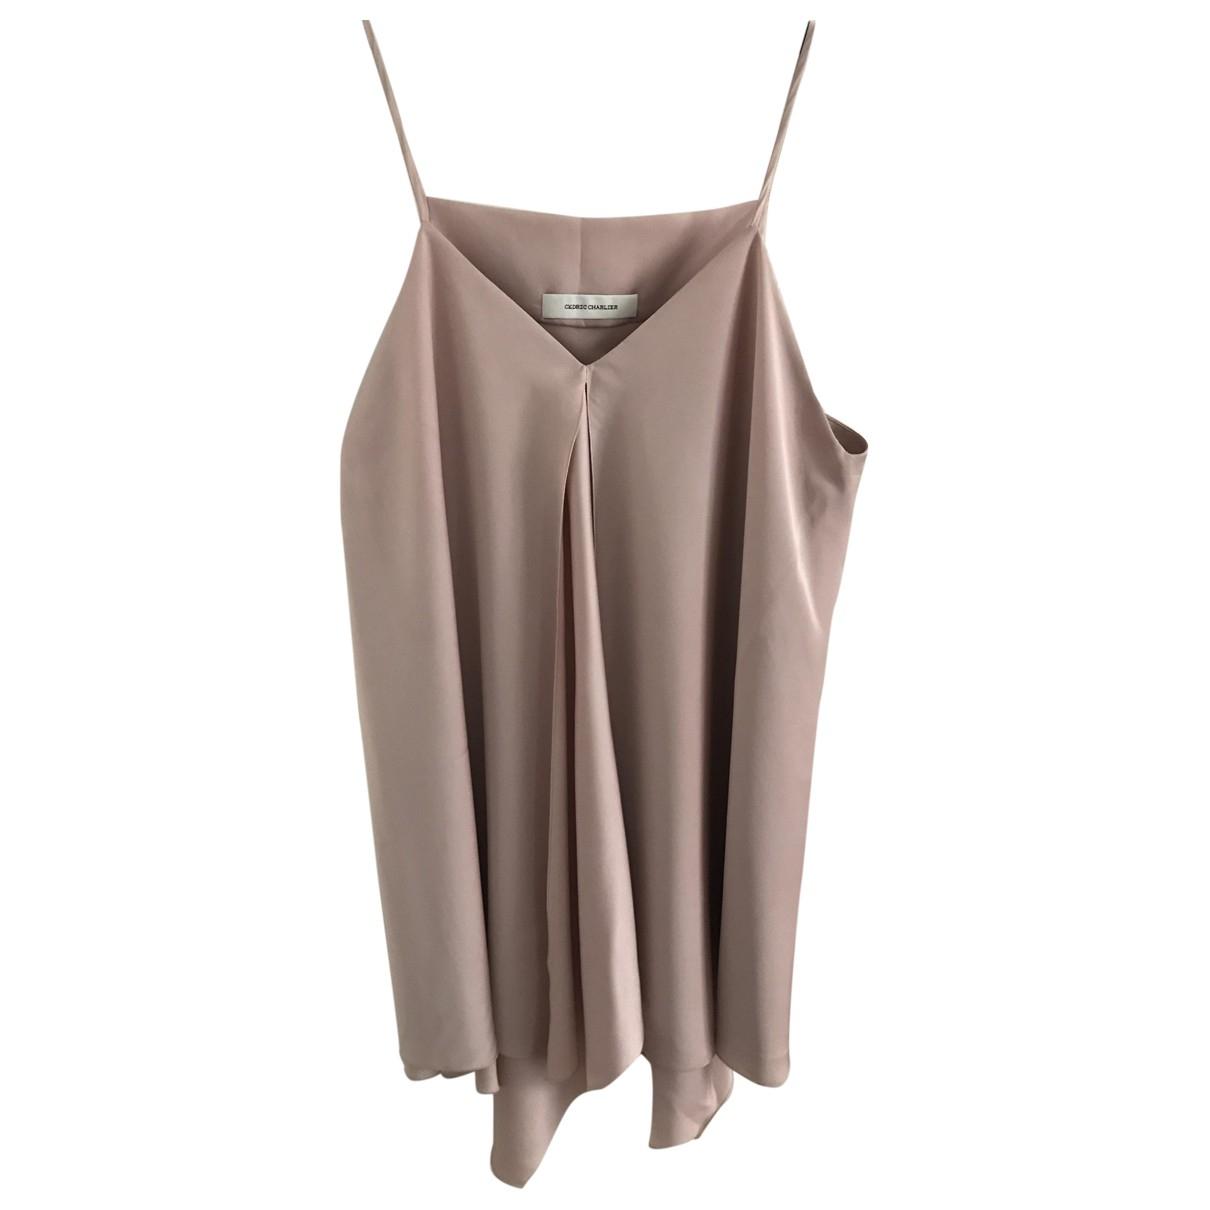 Cédric Charlier \N Pink dress for Women 36 FR